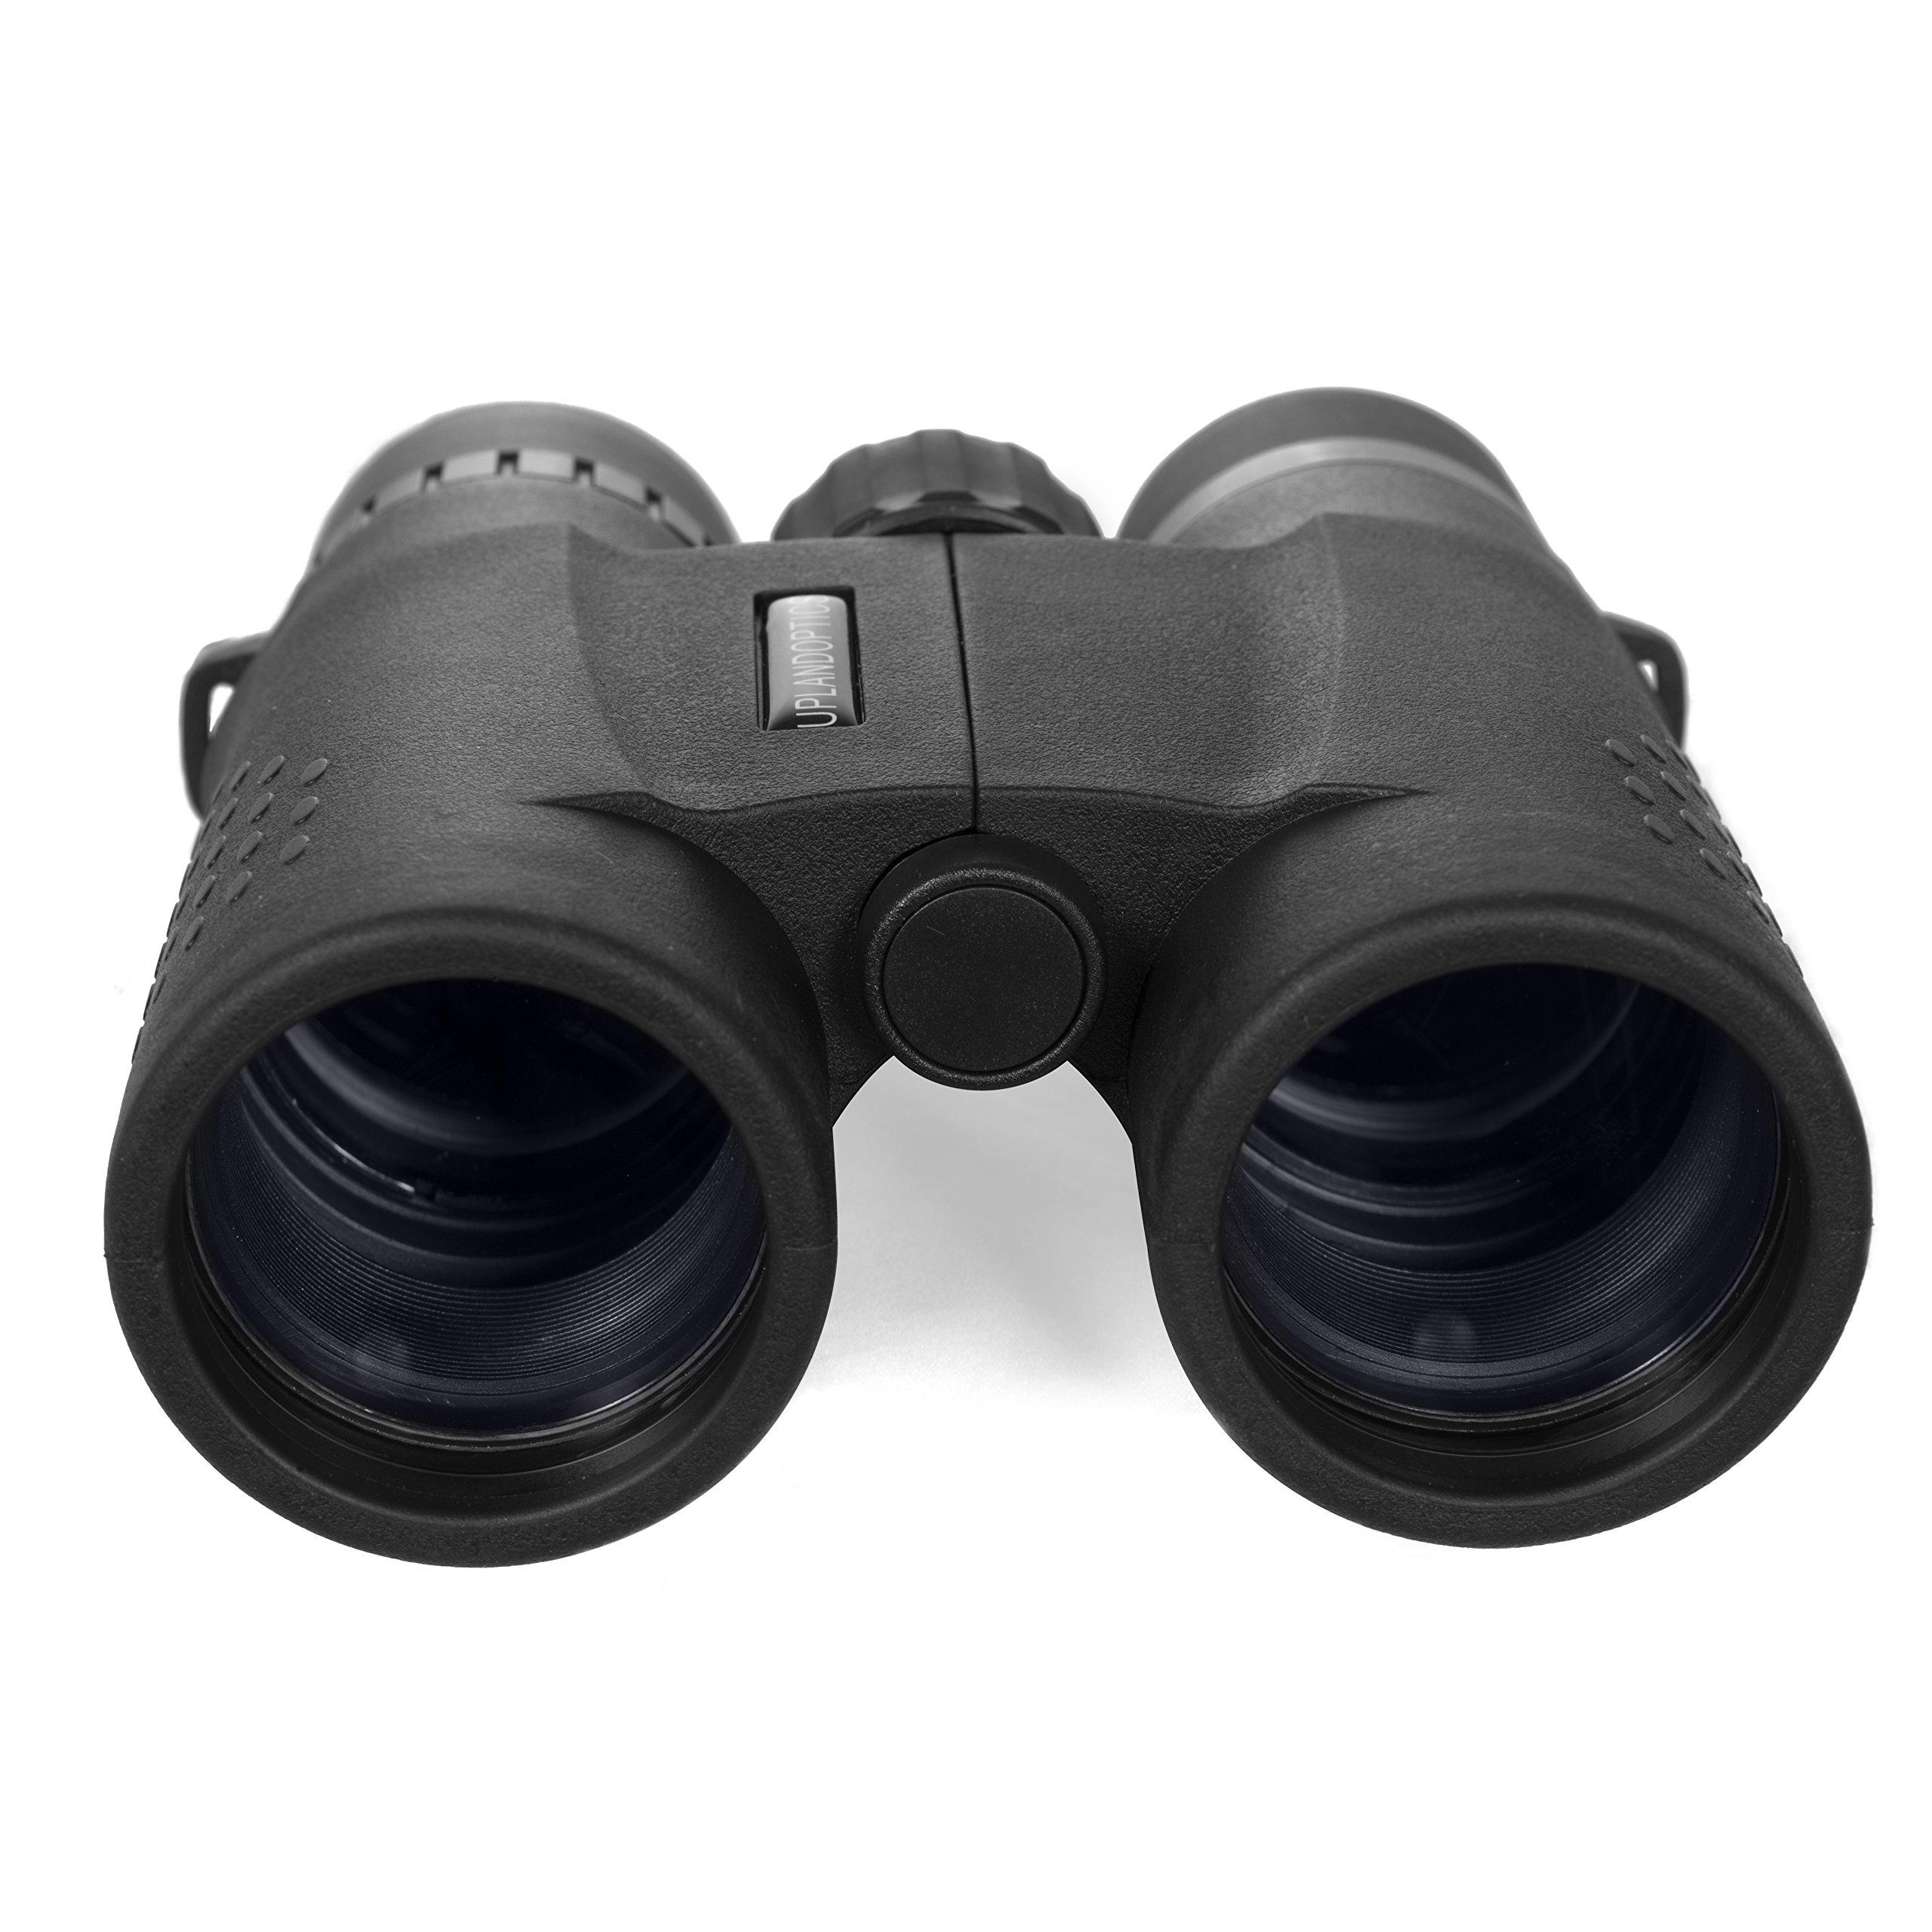 Upland Optics Perception HD 10x42mm Hunting Binoculars by Upland Optics